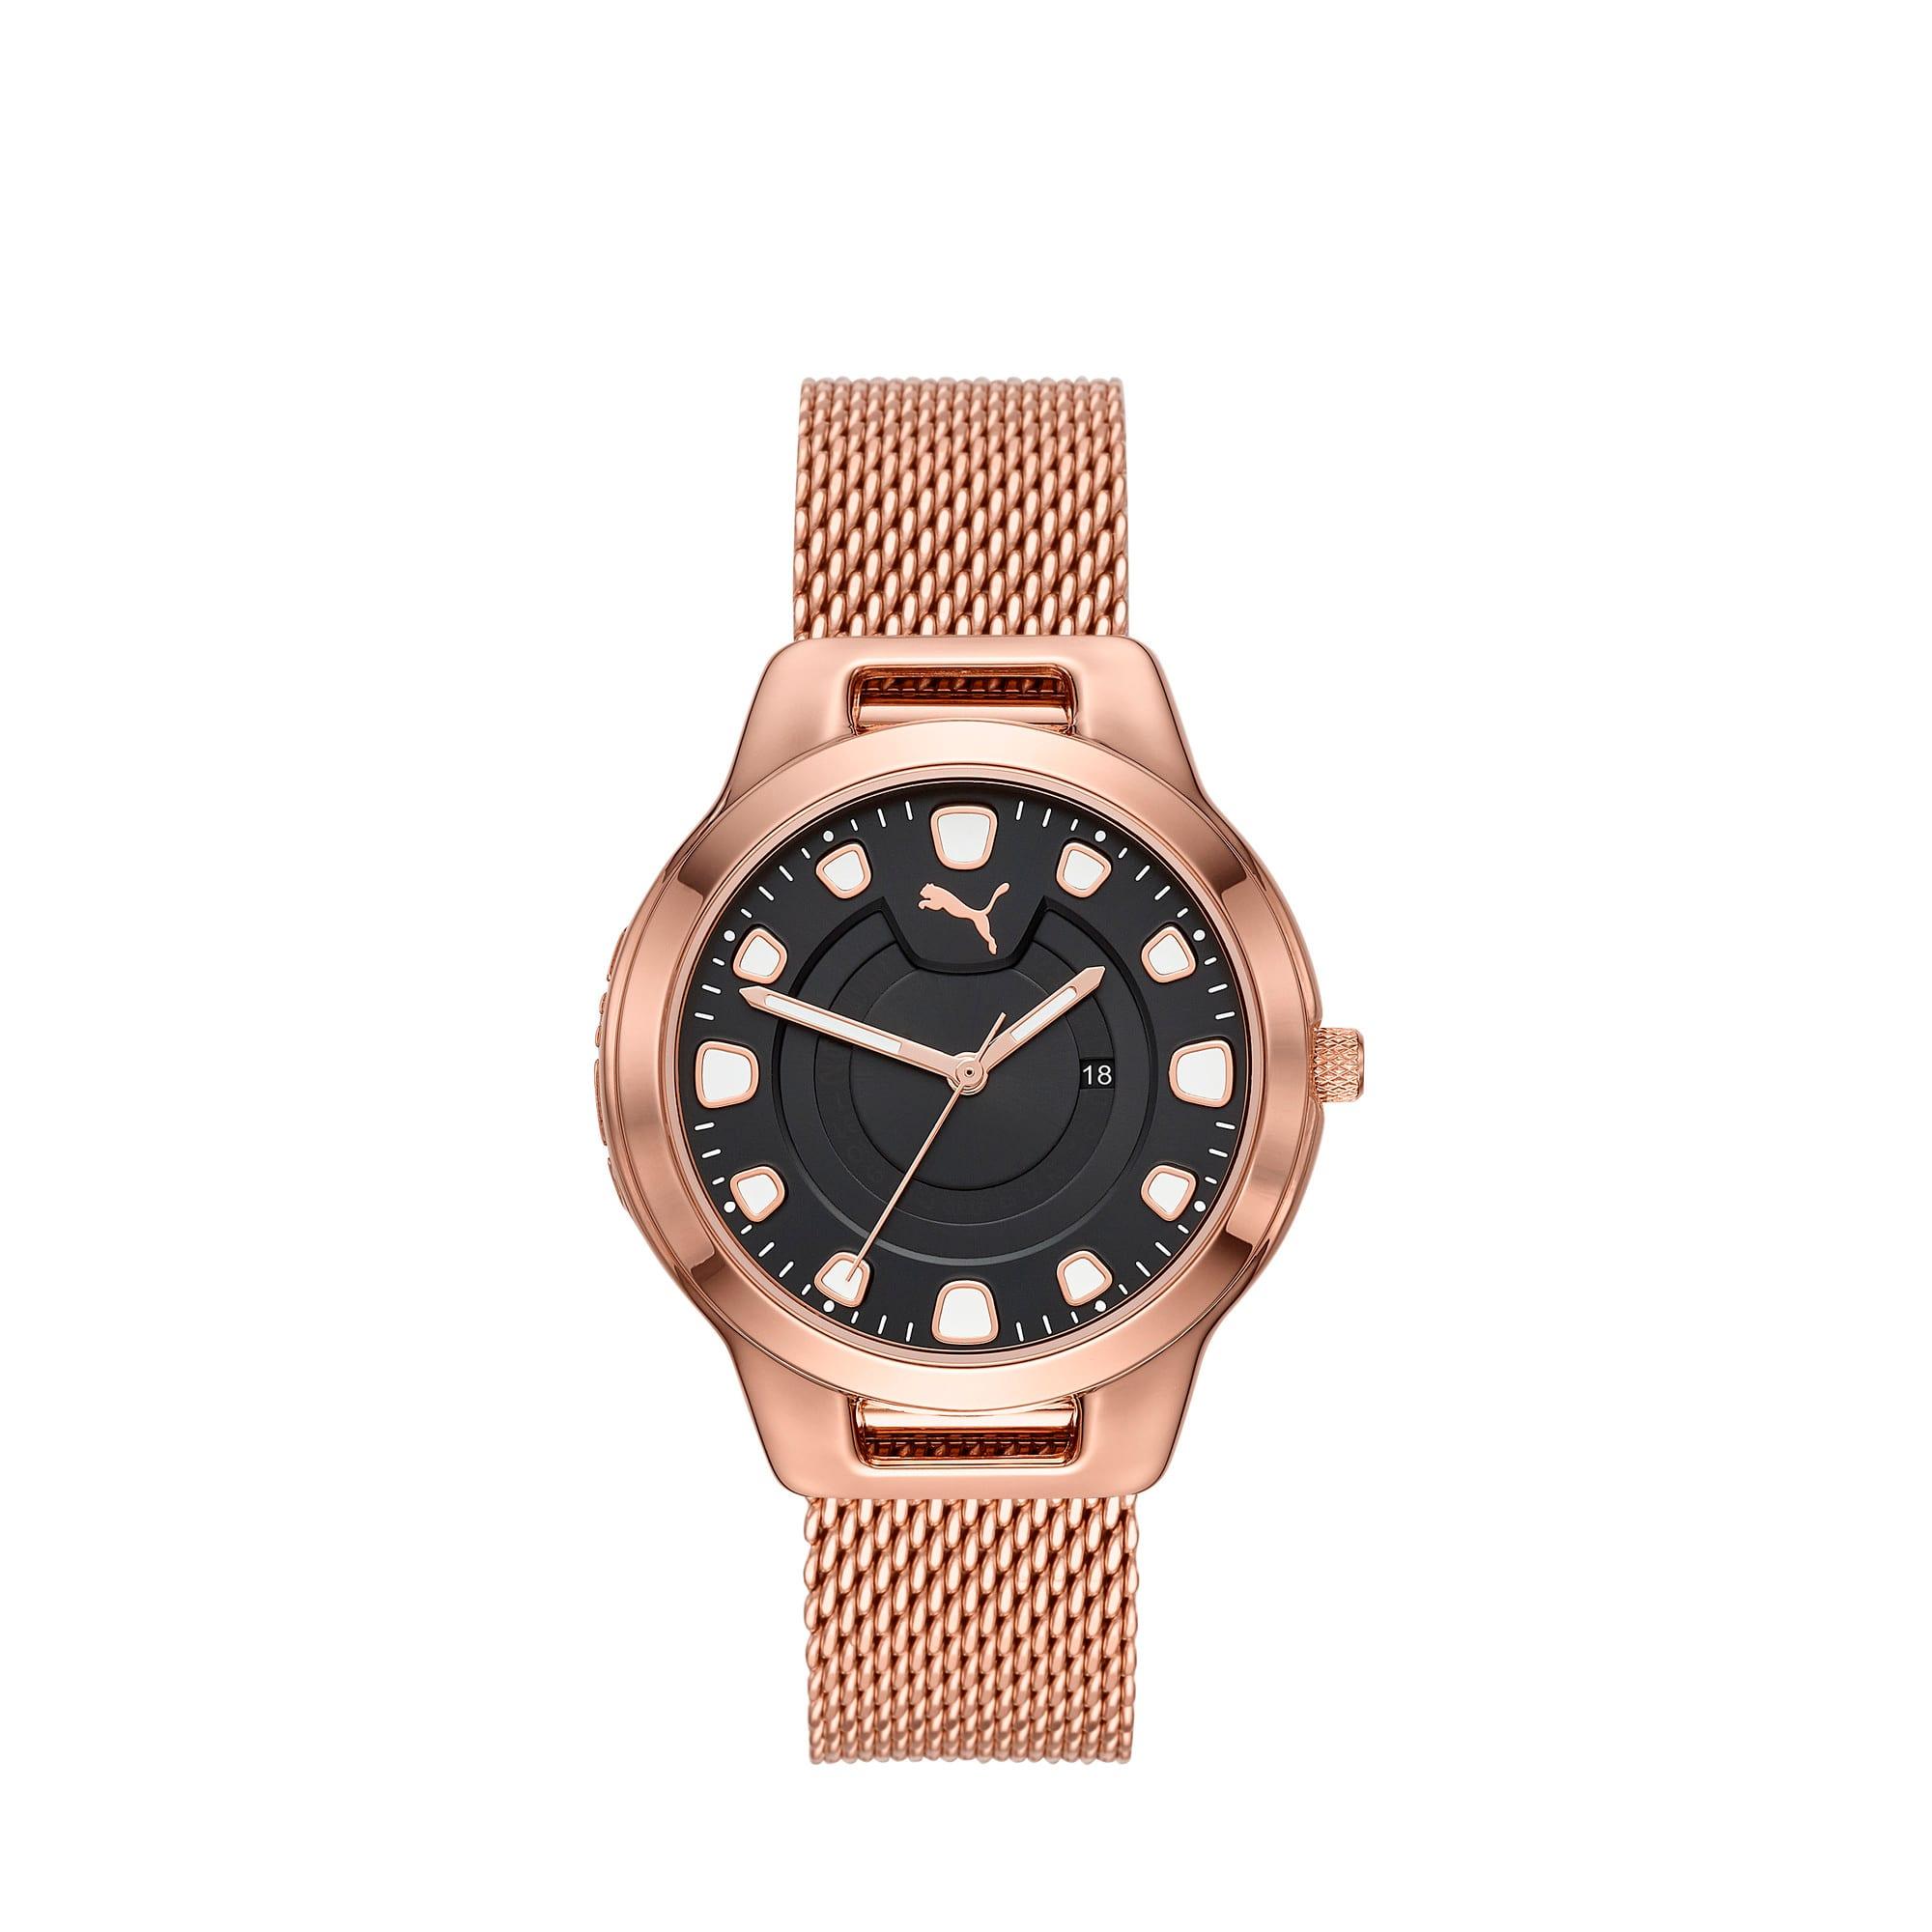 Thumbnail 1 of Reset v1 Watch, Rose Gold/Rose Gold, medium